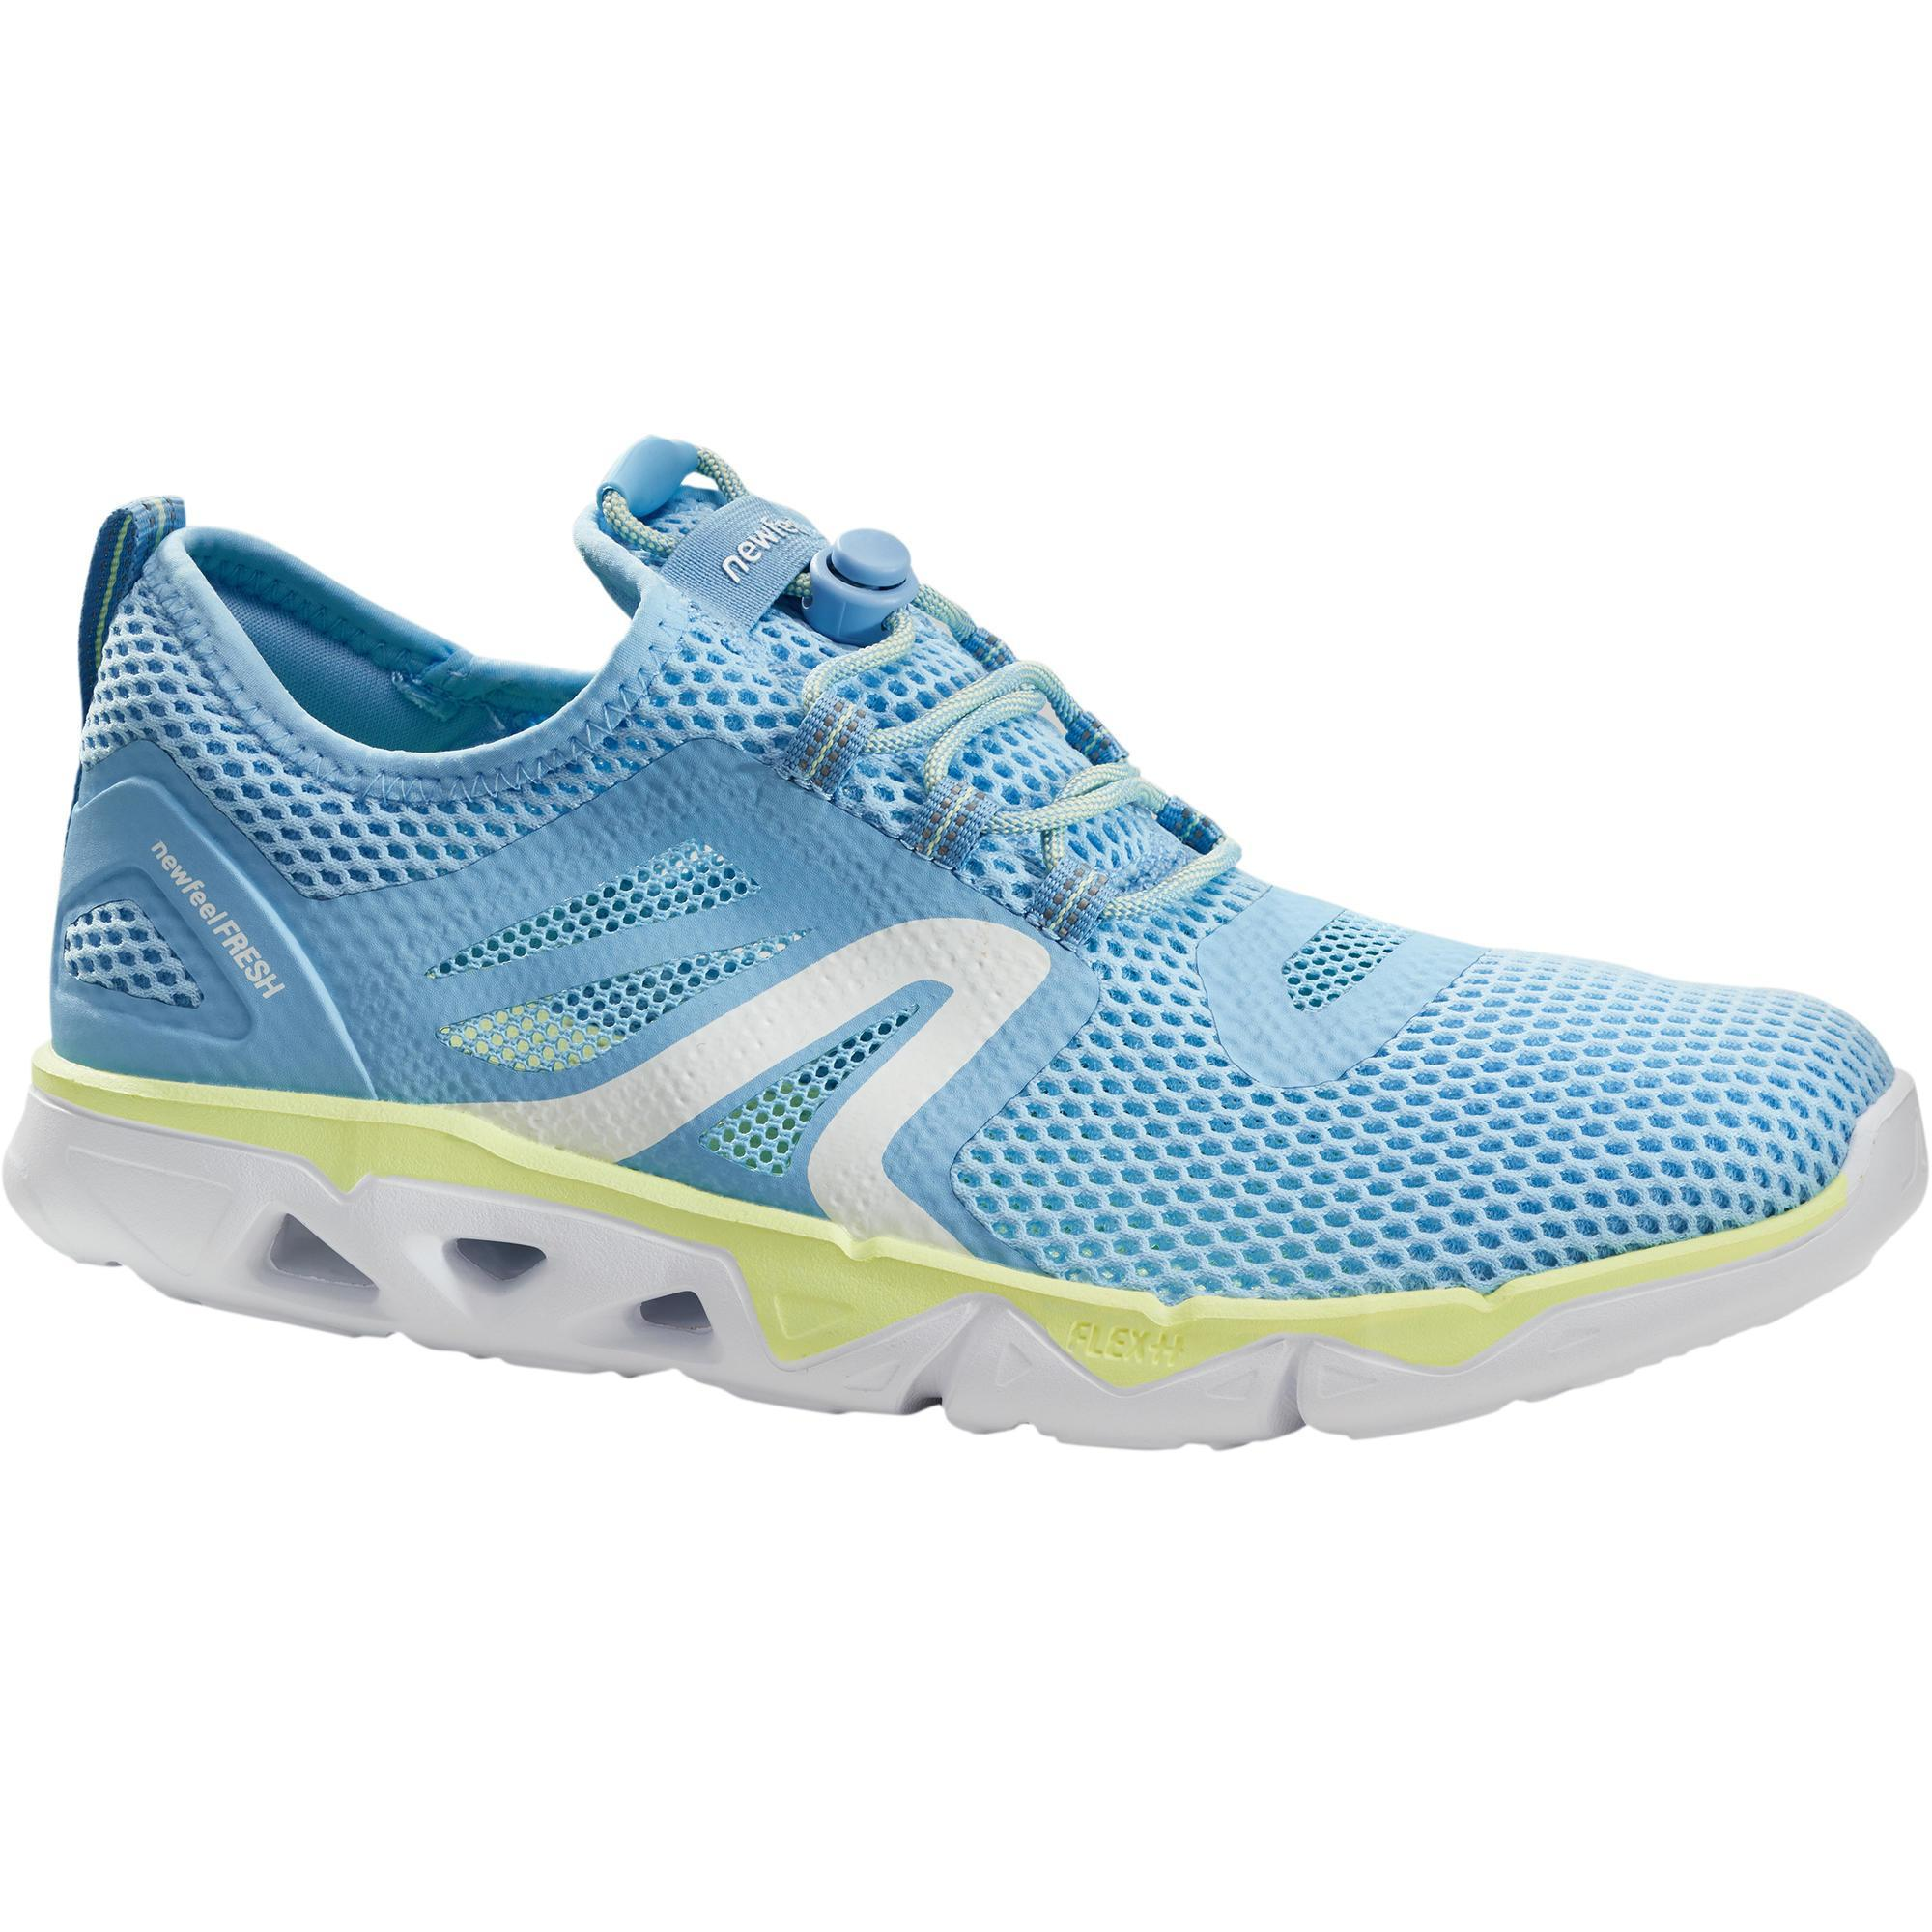 Walkingschuhe PW 500 Fresh Damen blau/gelb | Schuhe > Sportschuhe > Walkingschuhe | Blau - Gelb | Newfeel